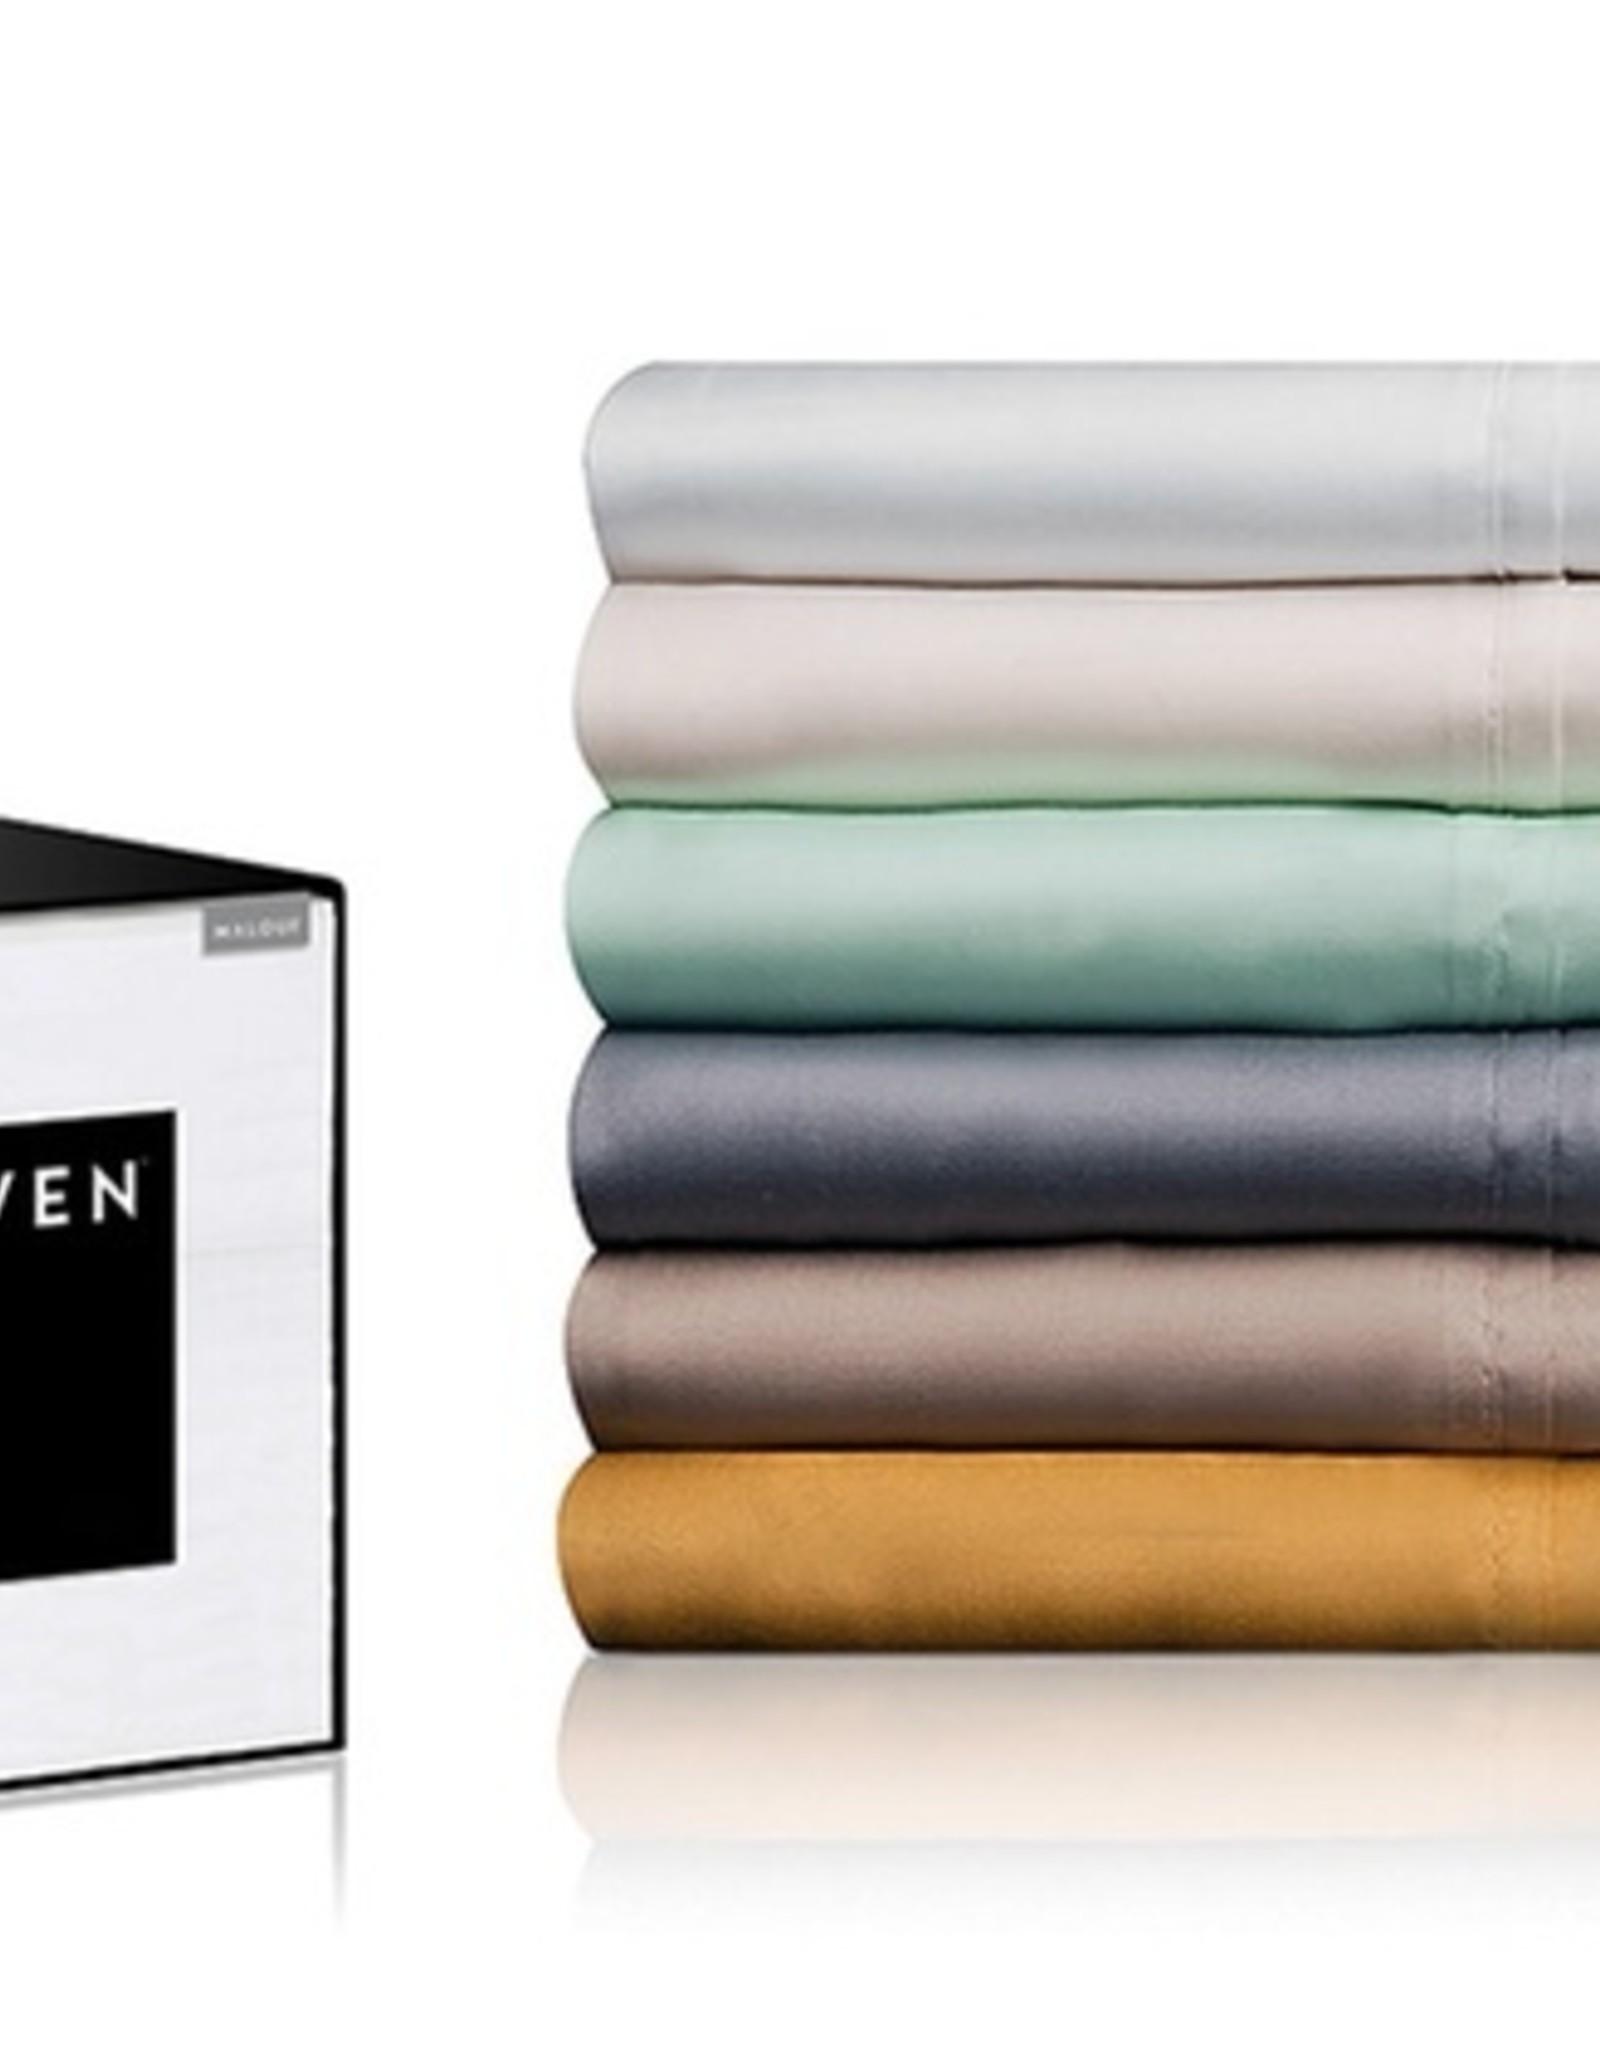 Malouf Tencel Sheet Set - Queen Size